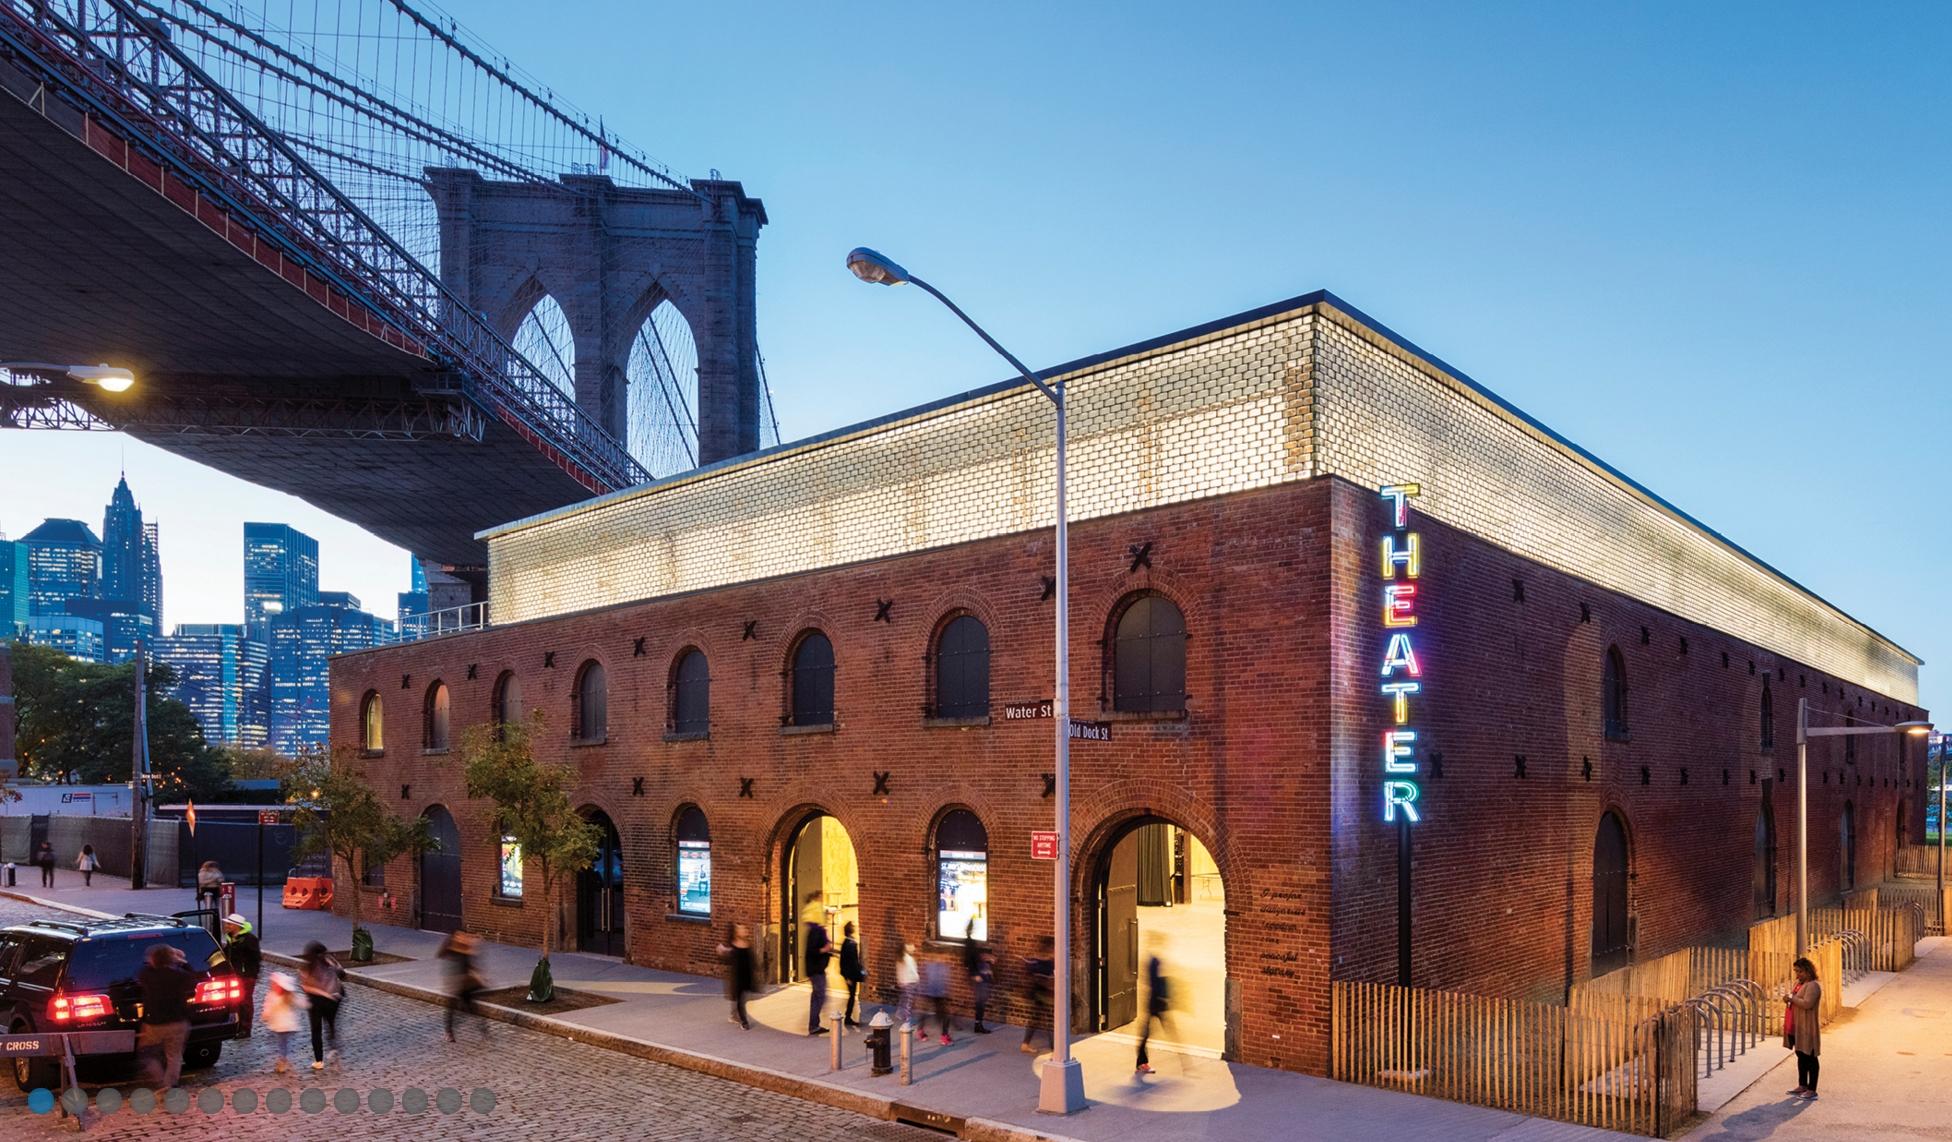 St. Anns Warehouse - Nice Fish show - Dumbo Brooklyn New York1.jpg